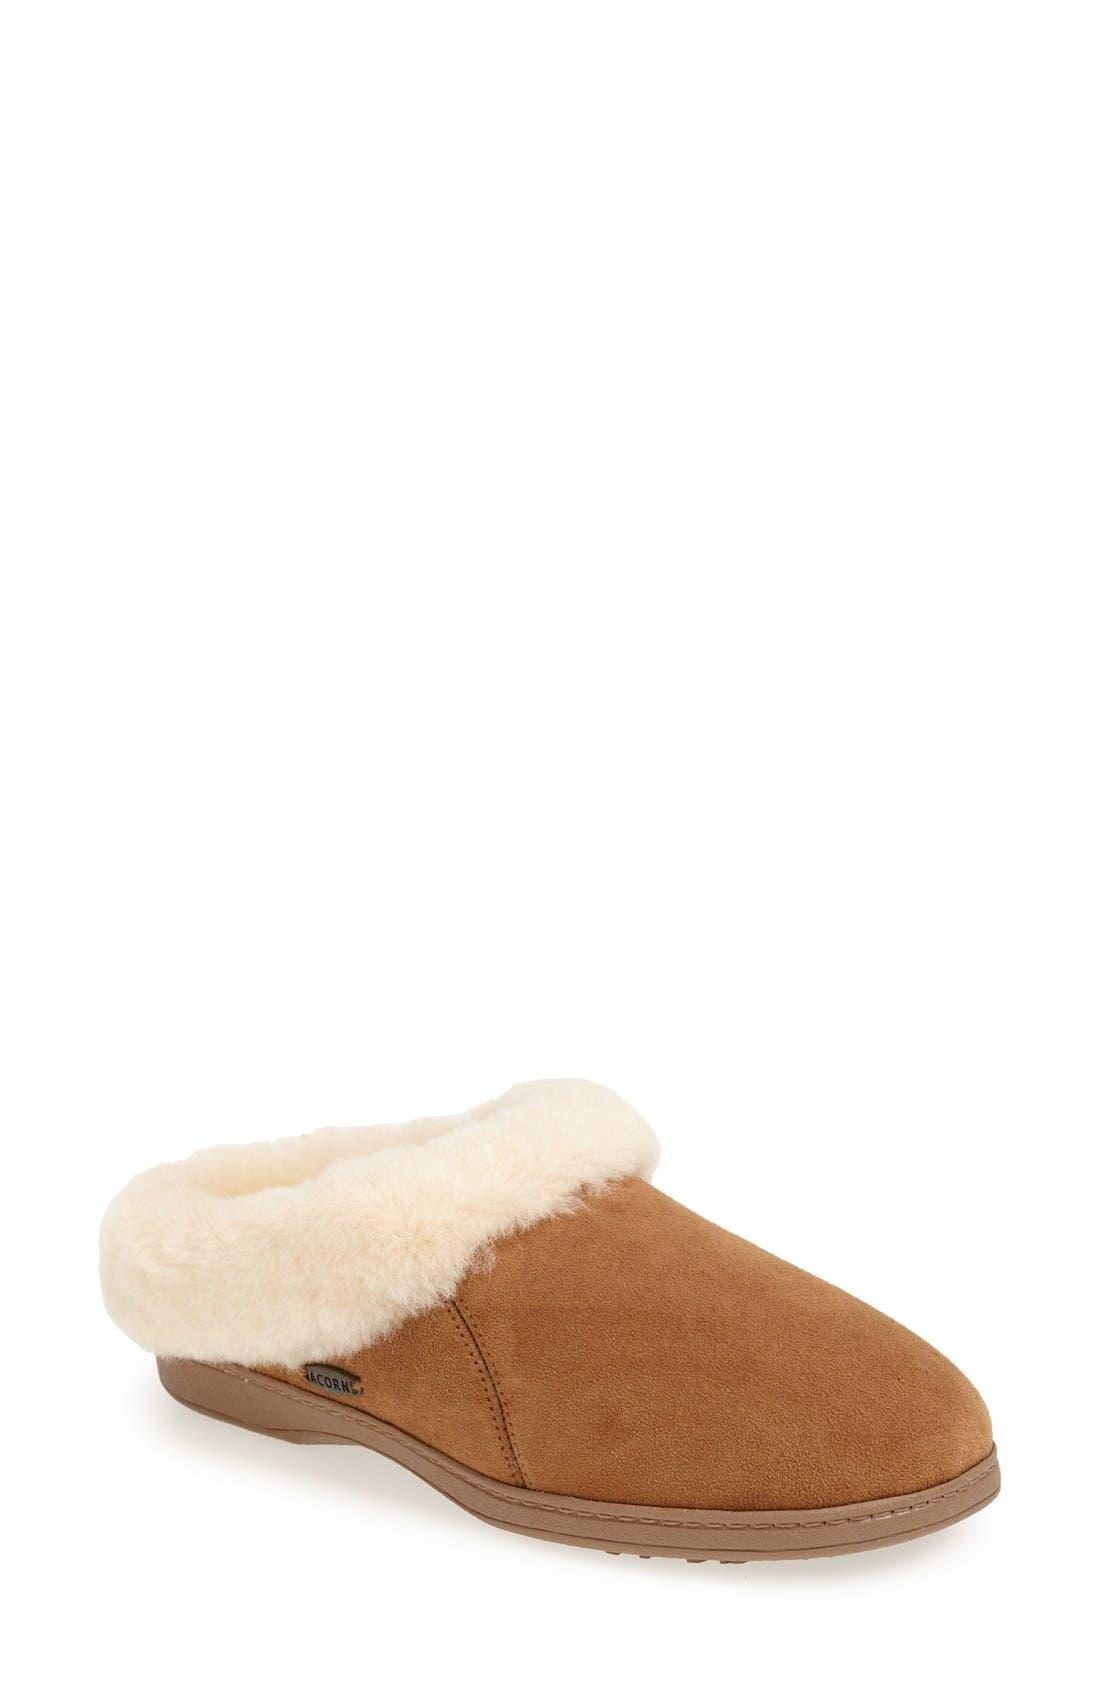 'Ewe Collar' Genuine Sheepskin Mule Slipper, Main, color, WALNUT